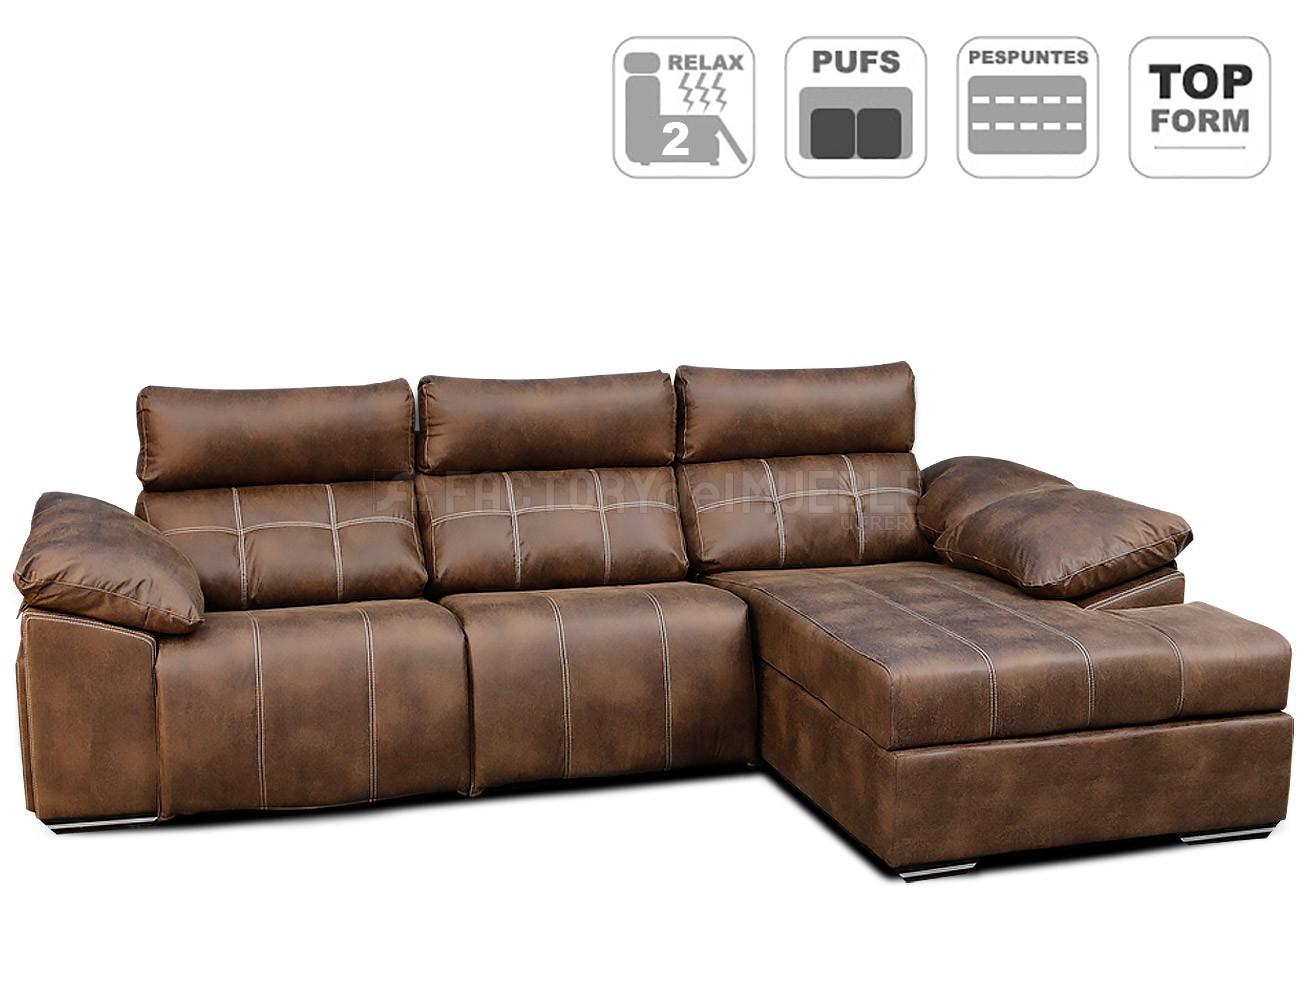 Sofas en sevilla baratos elegant sof cama para saln for Sofas modernos sevilla